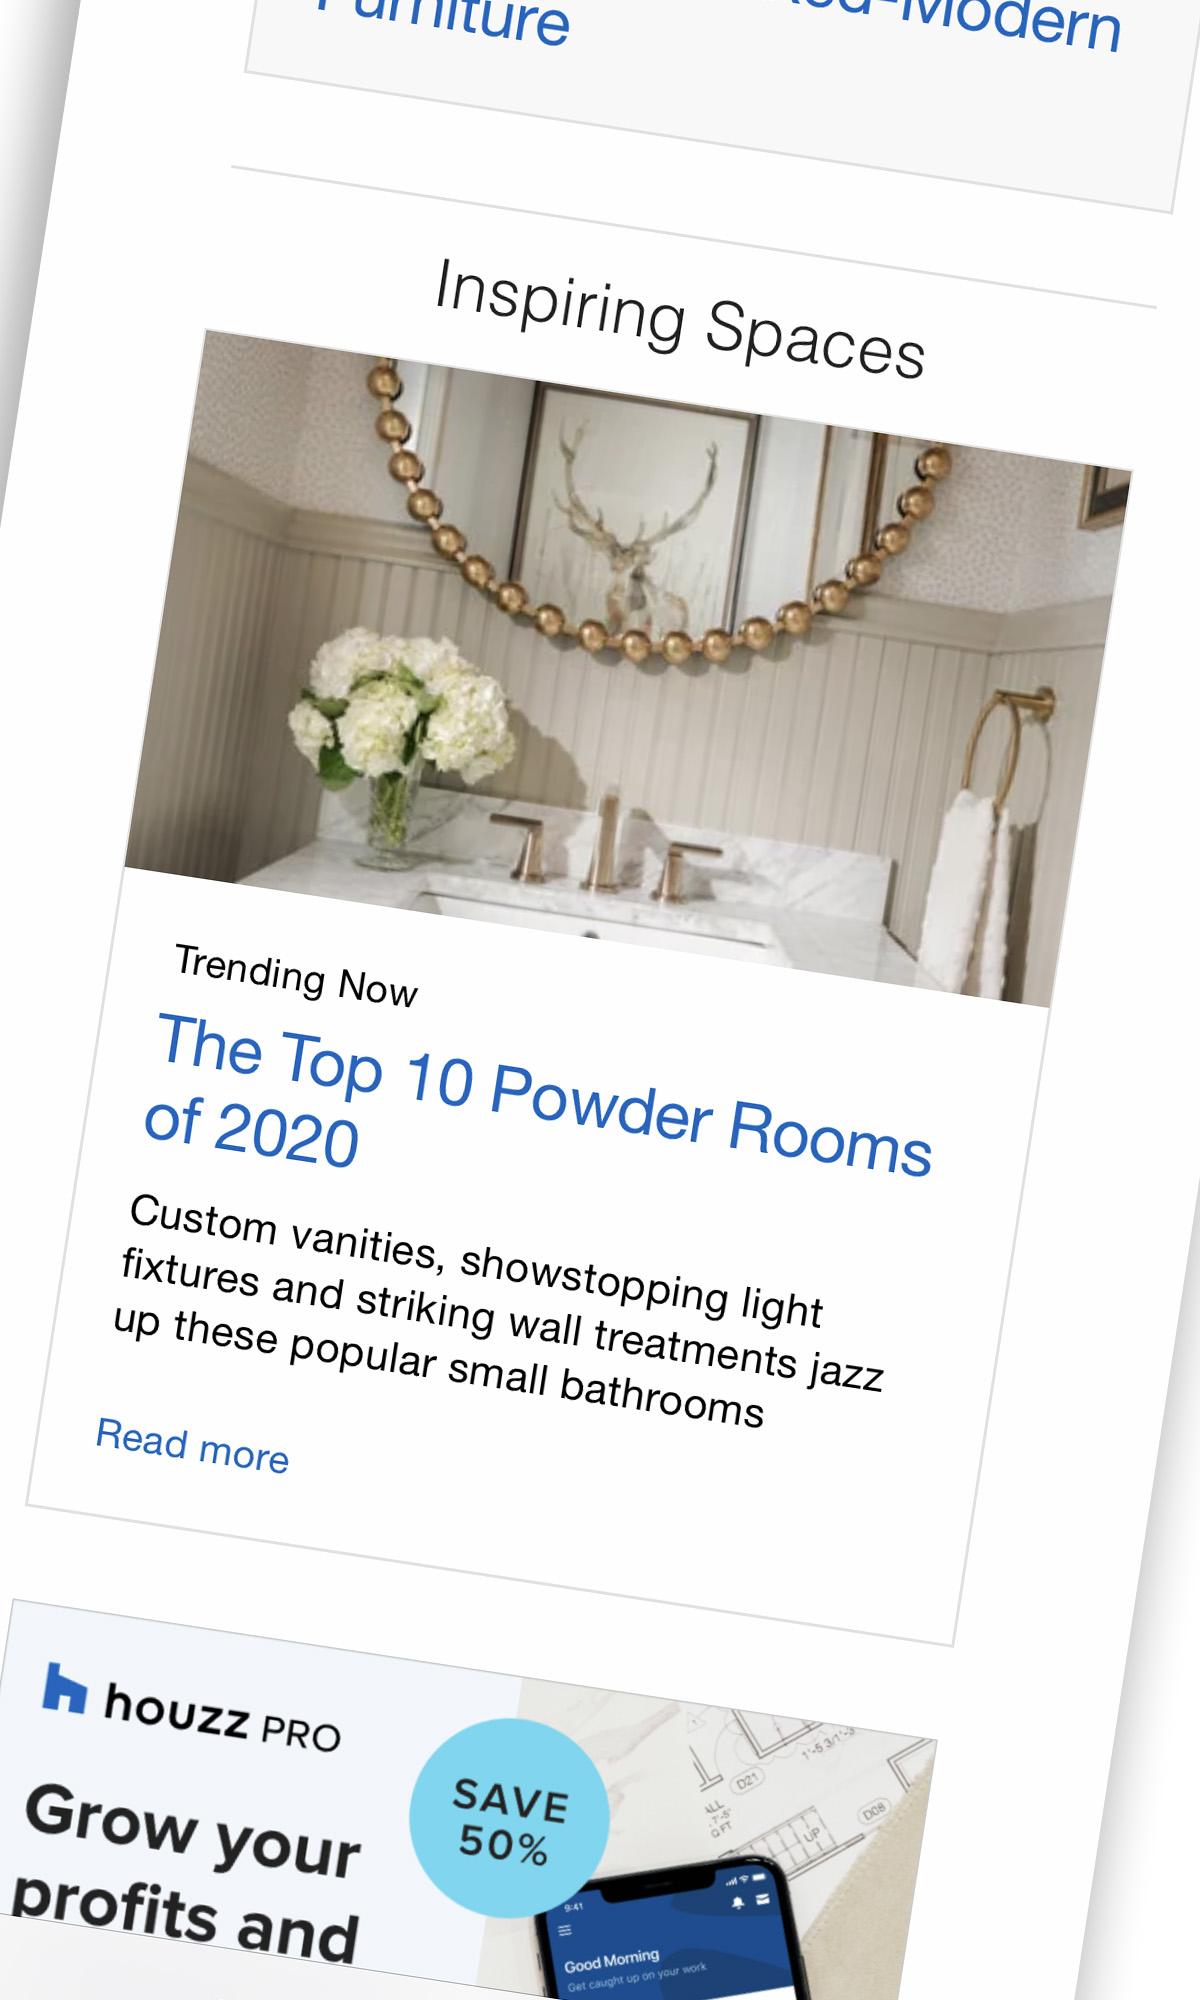 Top 10 Powder Room Photos on Houzz